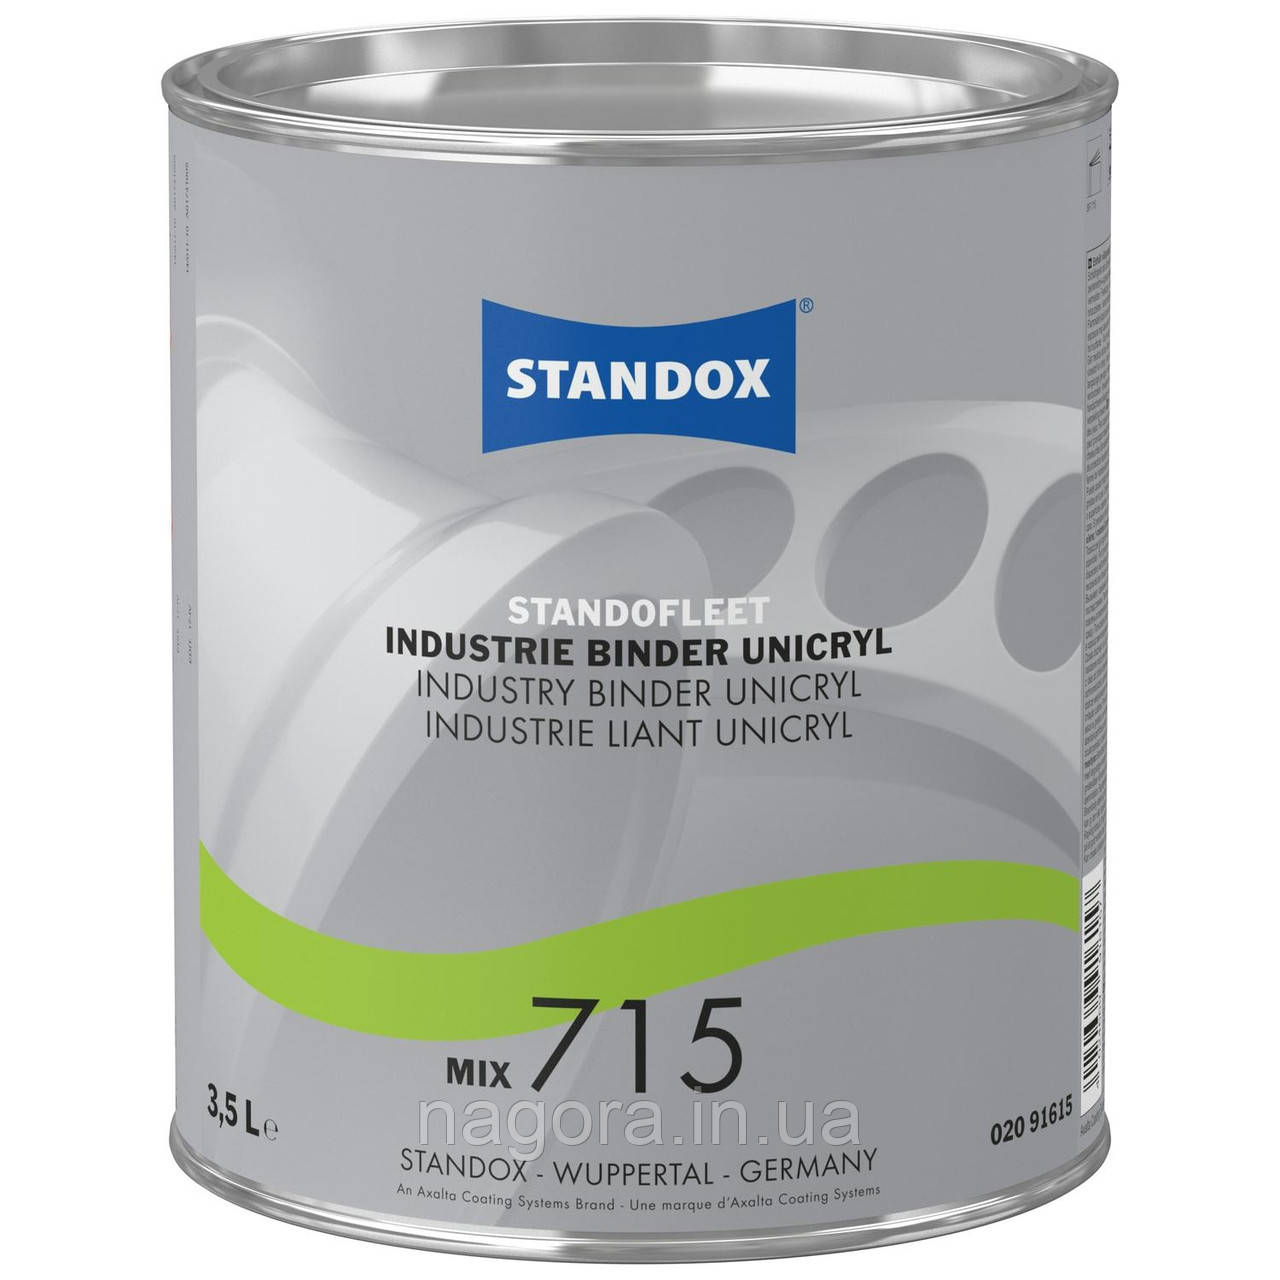 Поліуретанова грунт-емаль Standofleet Industry Unicryl Topcoat, RAL 6002 (John Deere)